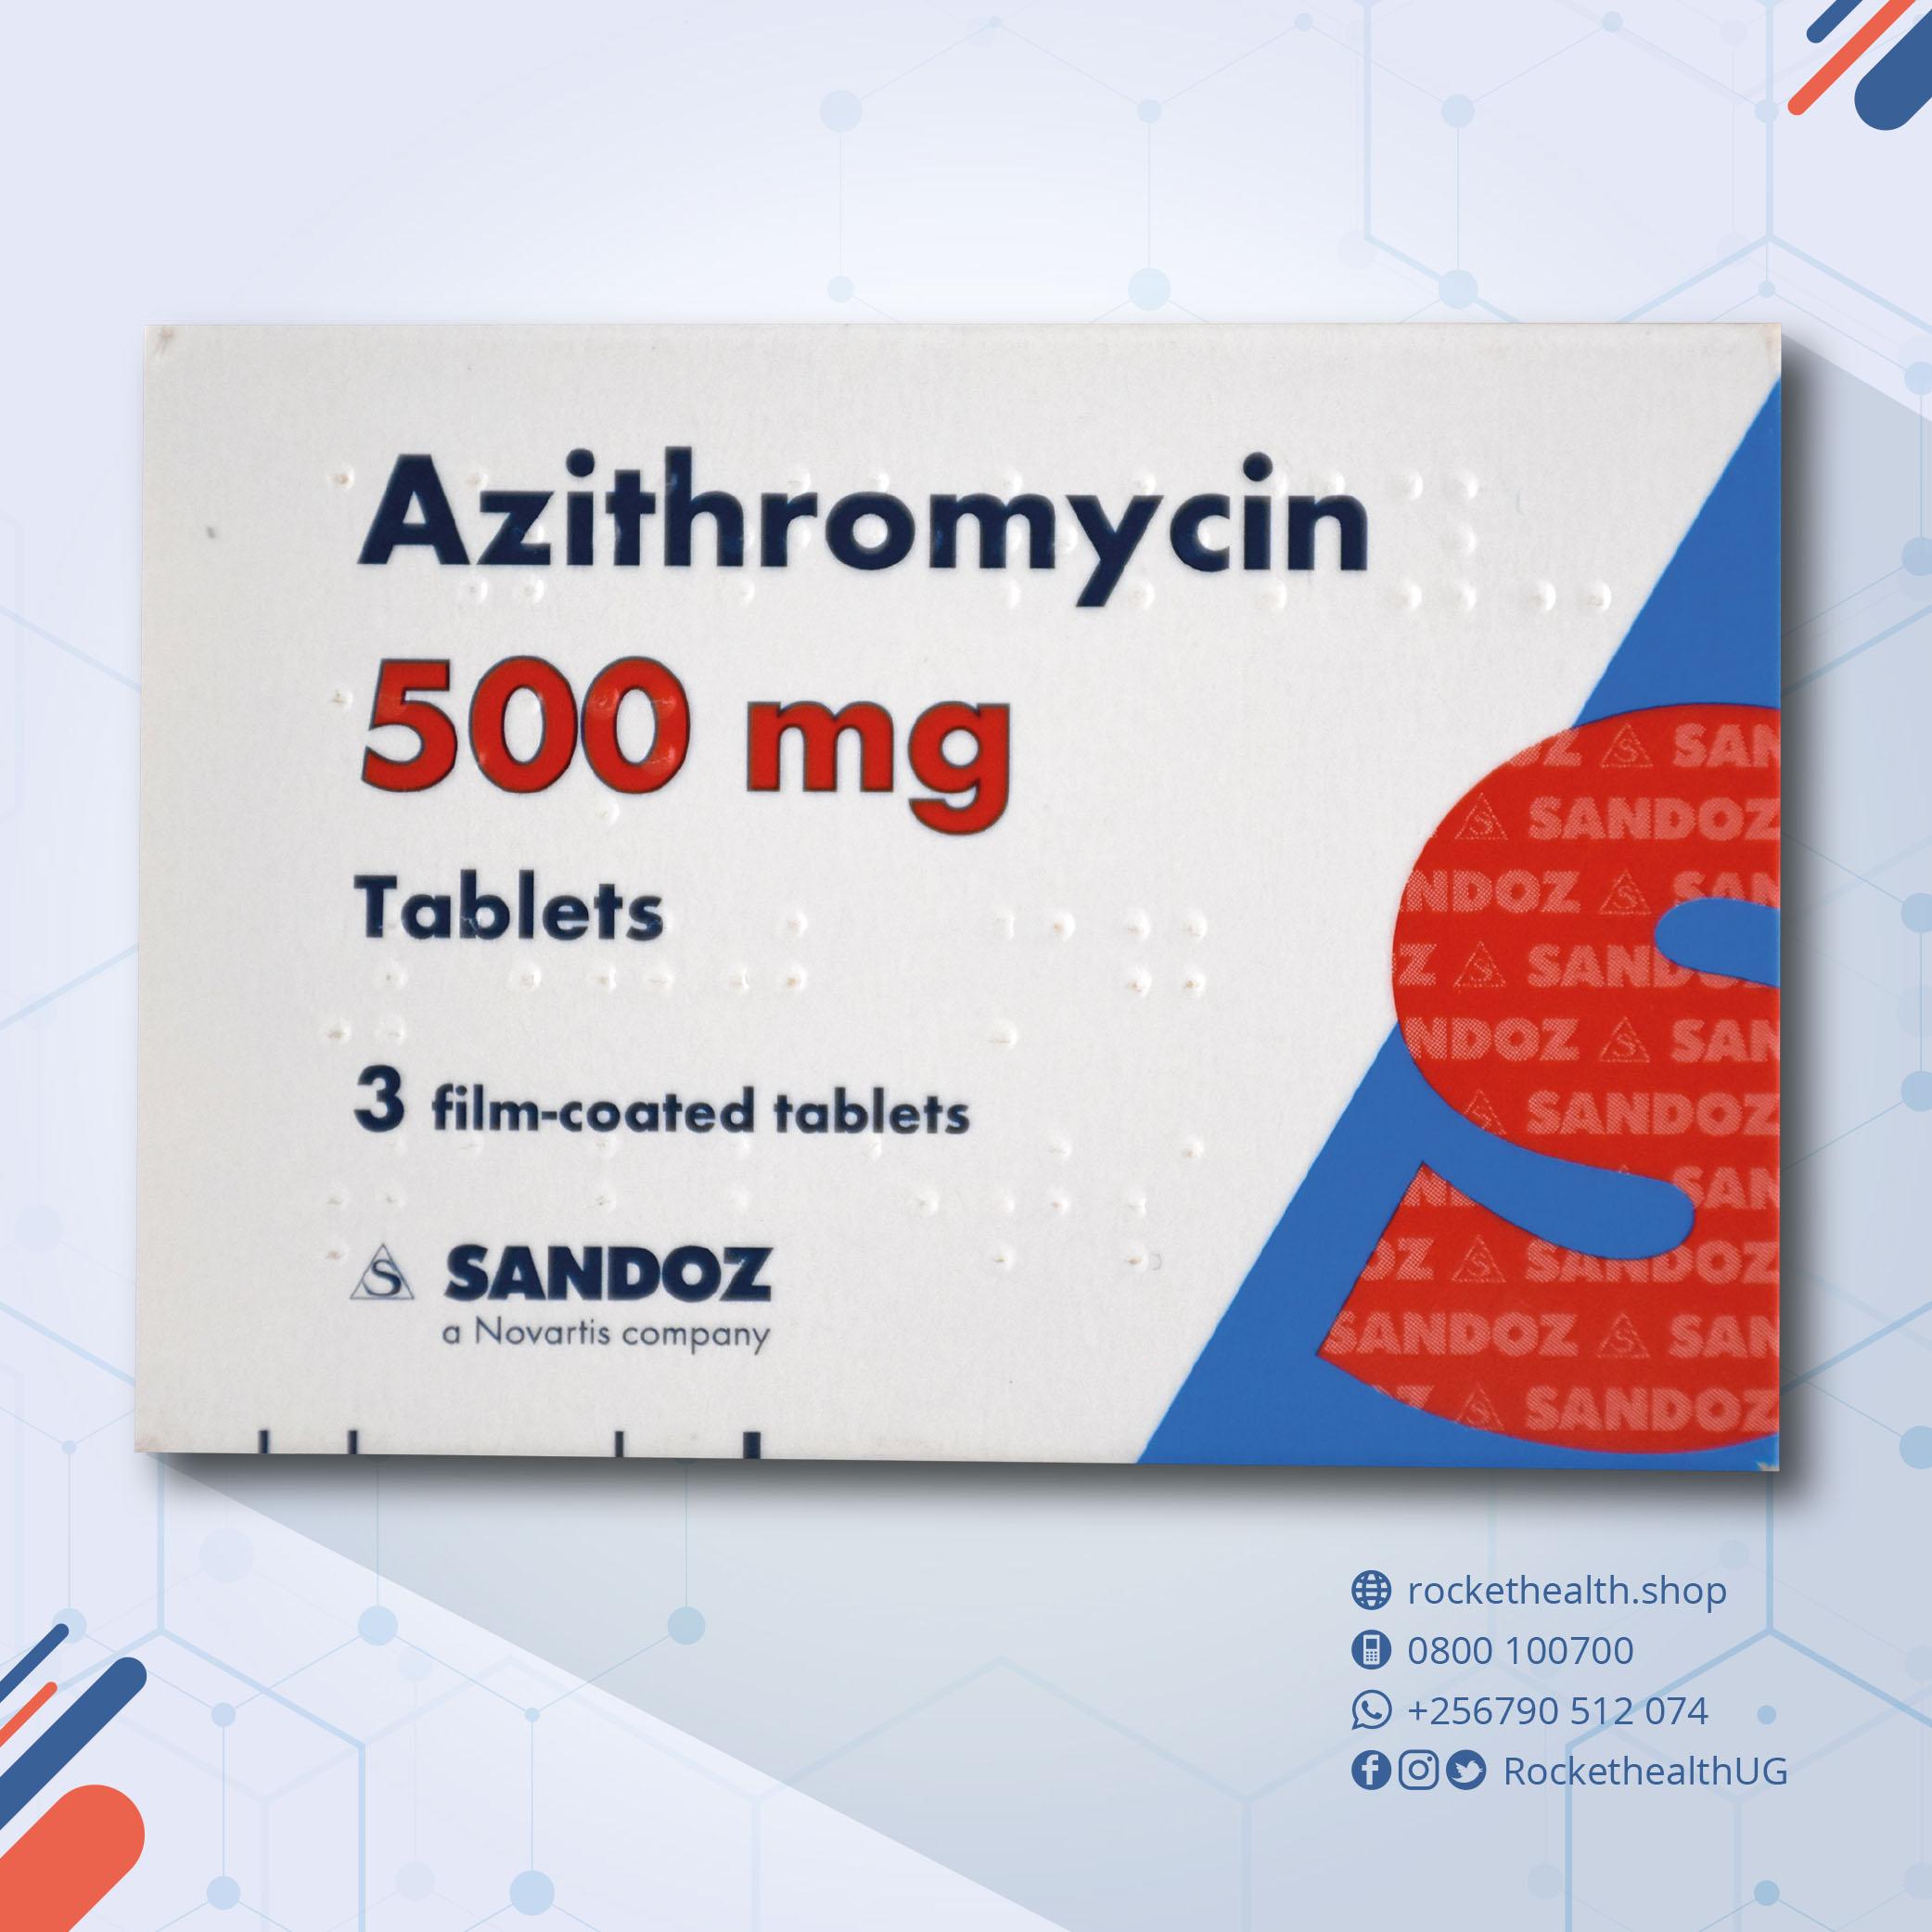 tienda azithromycin 500mg envío